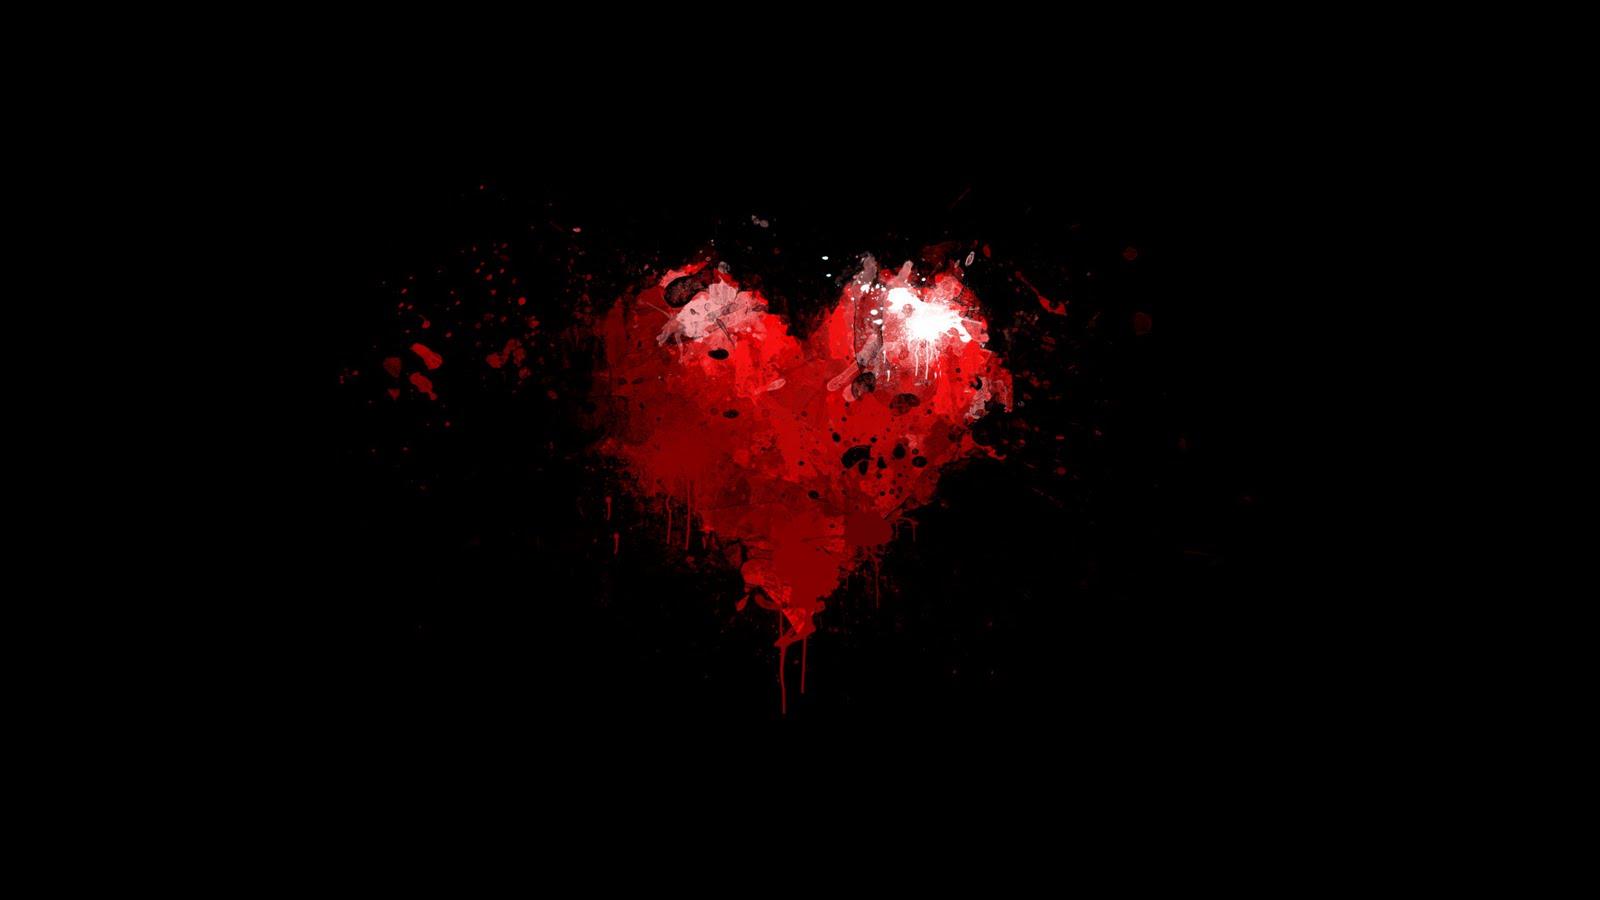 Dark Red Heart with Black Background